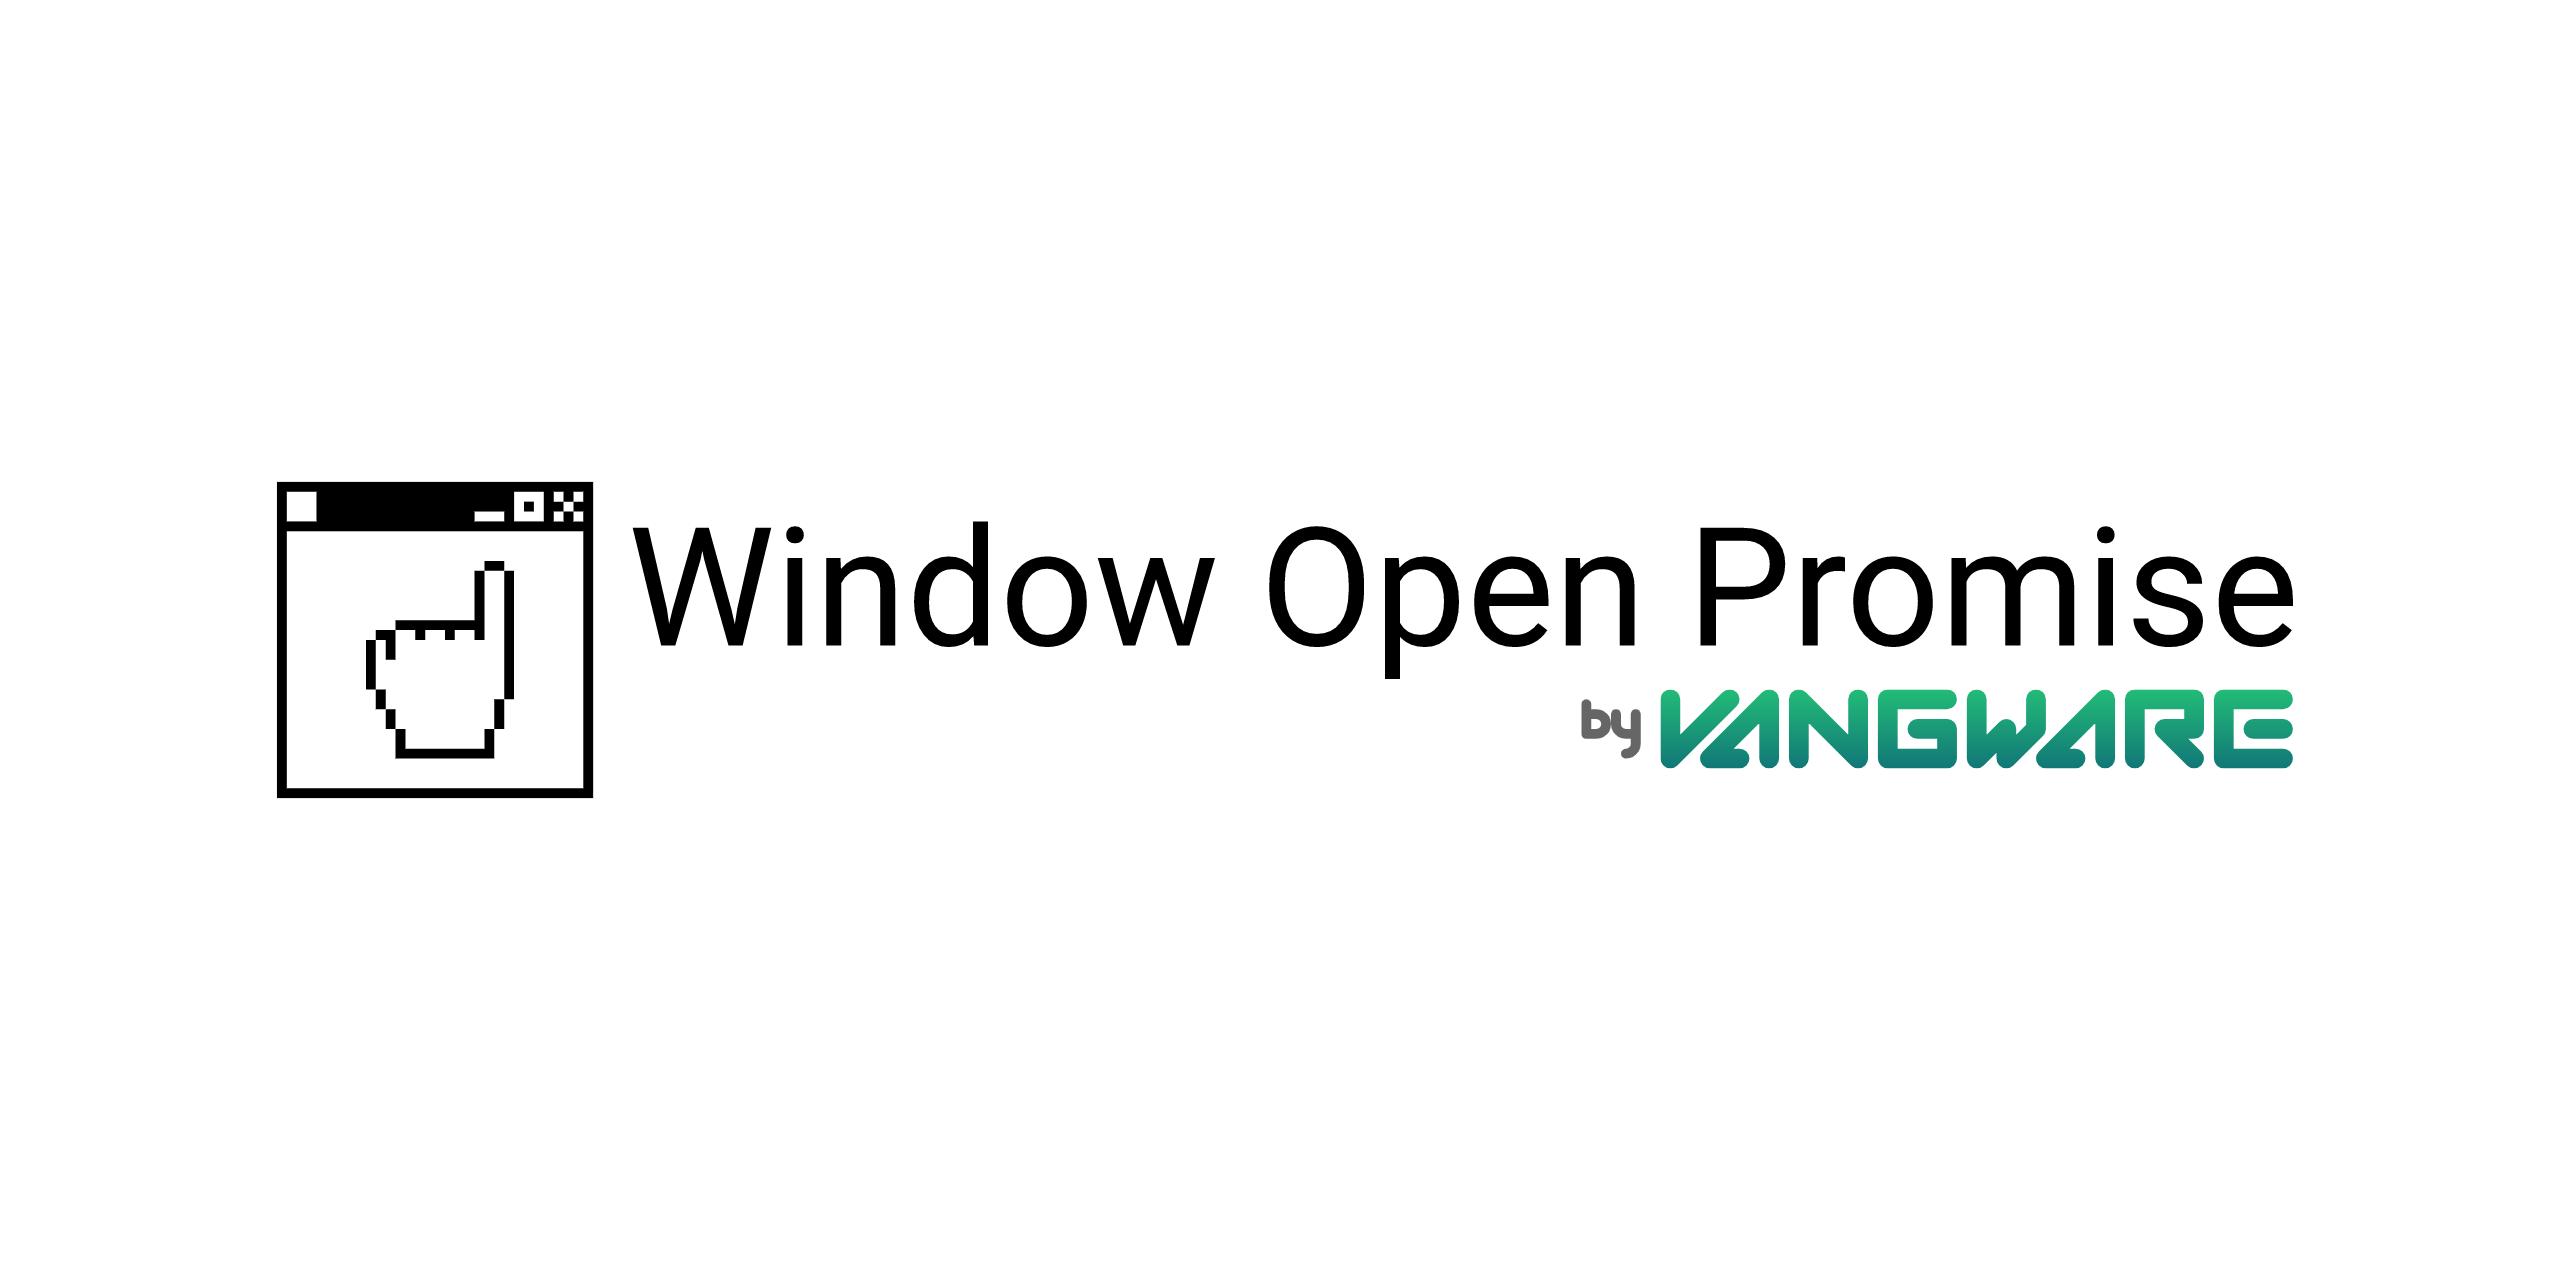 Window Open Promise by Vangware